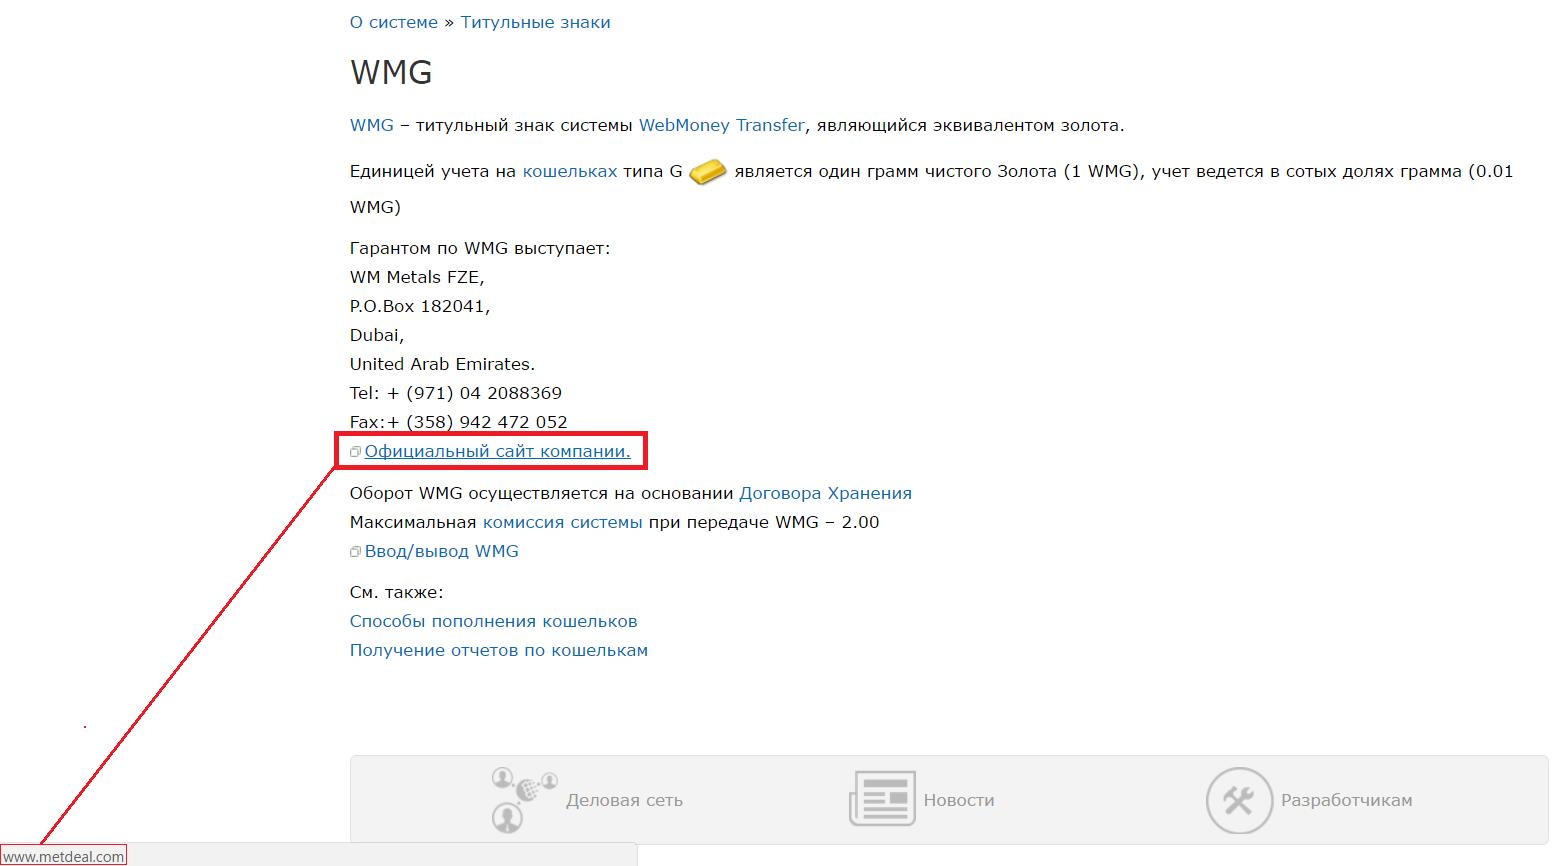 Гарант Вебмани WMG золото